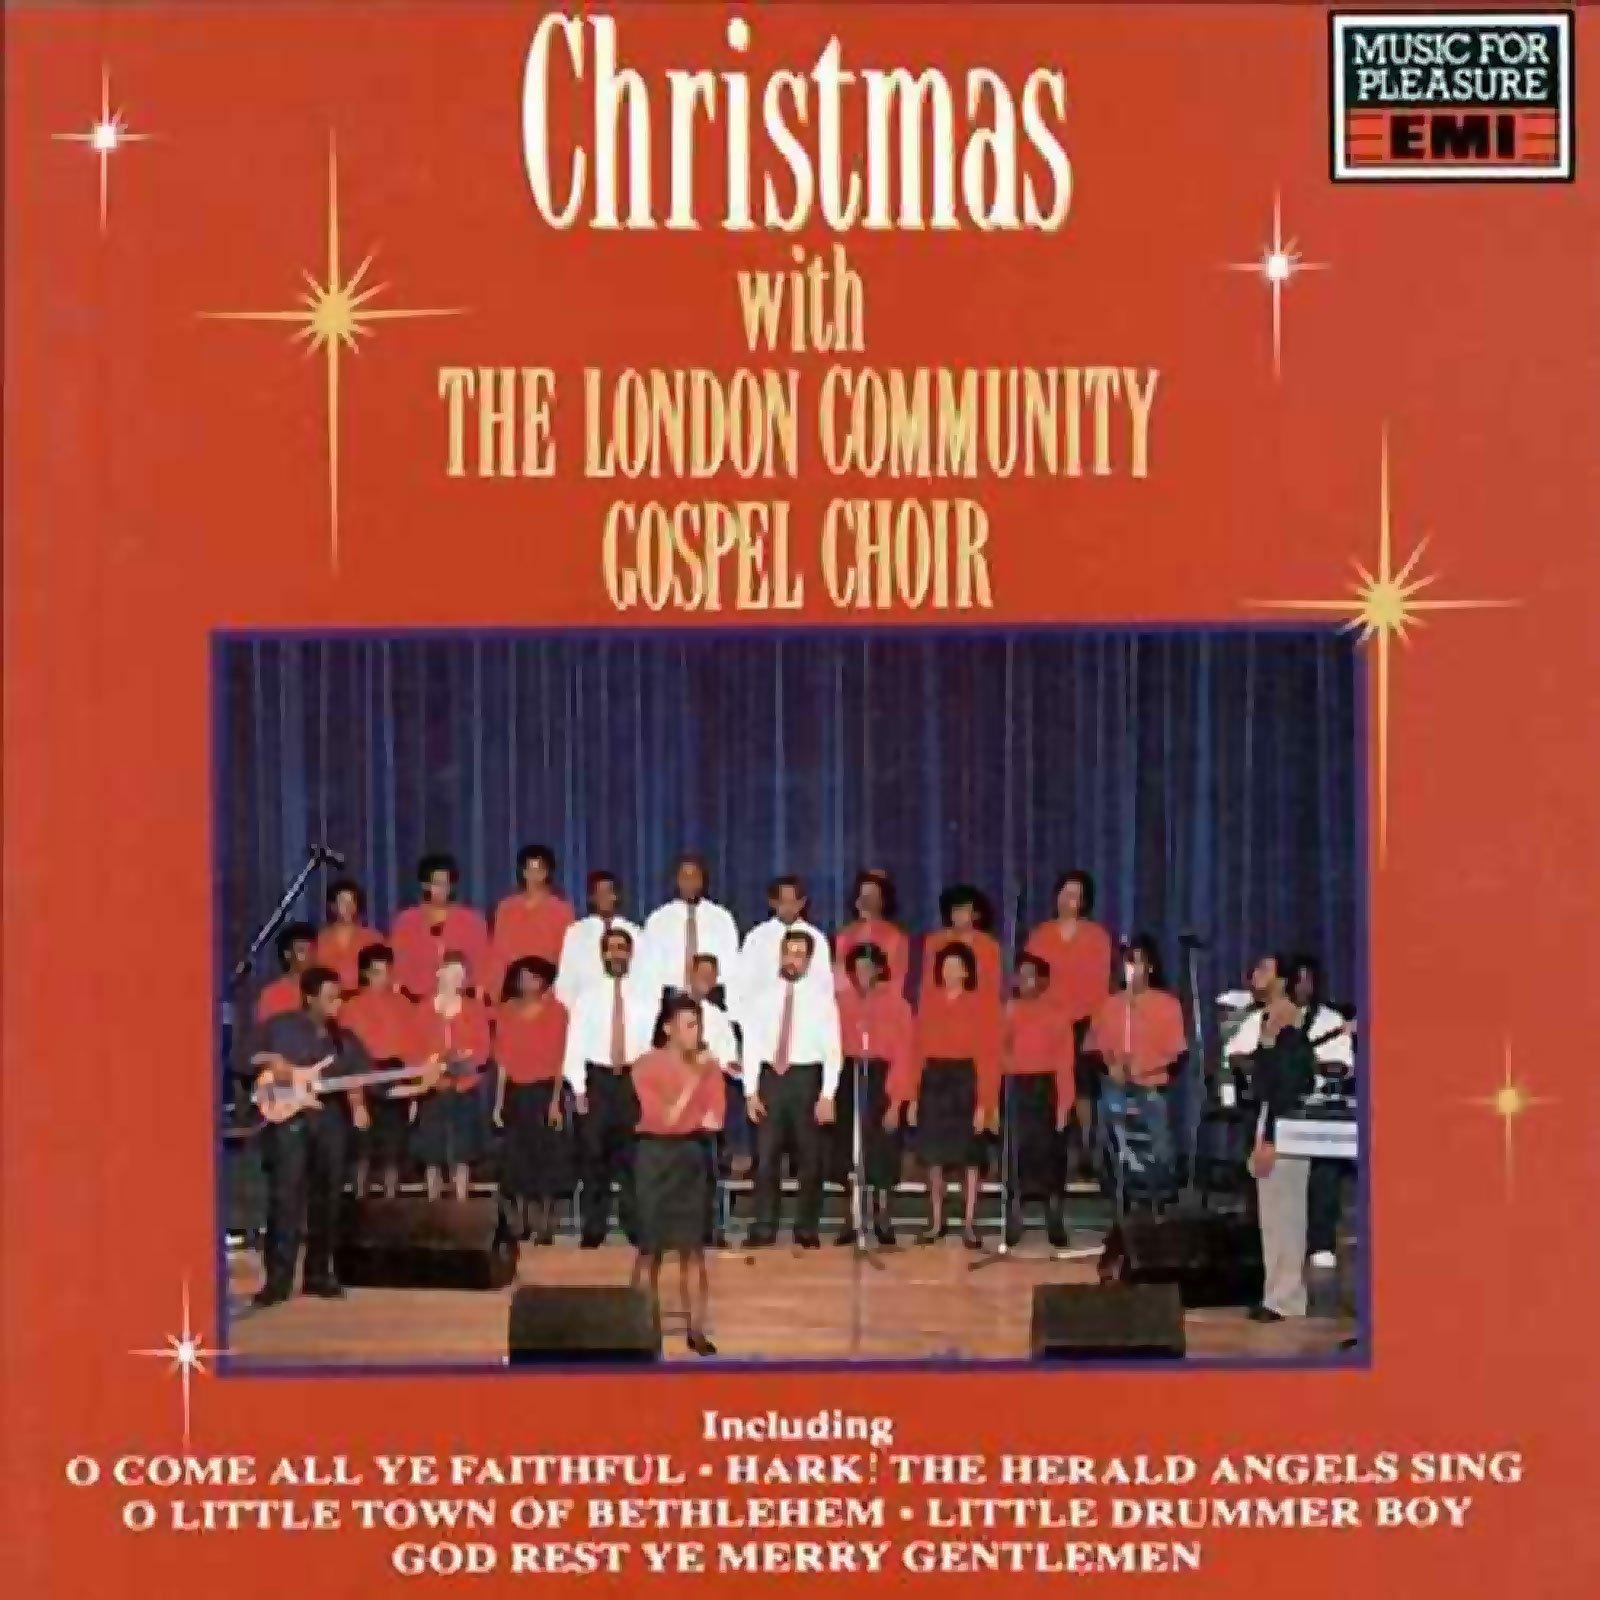 LCGC_Christmas_With_London_Community_Gospel_Choir_Cover_1600x1600